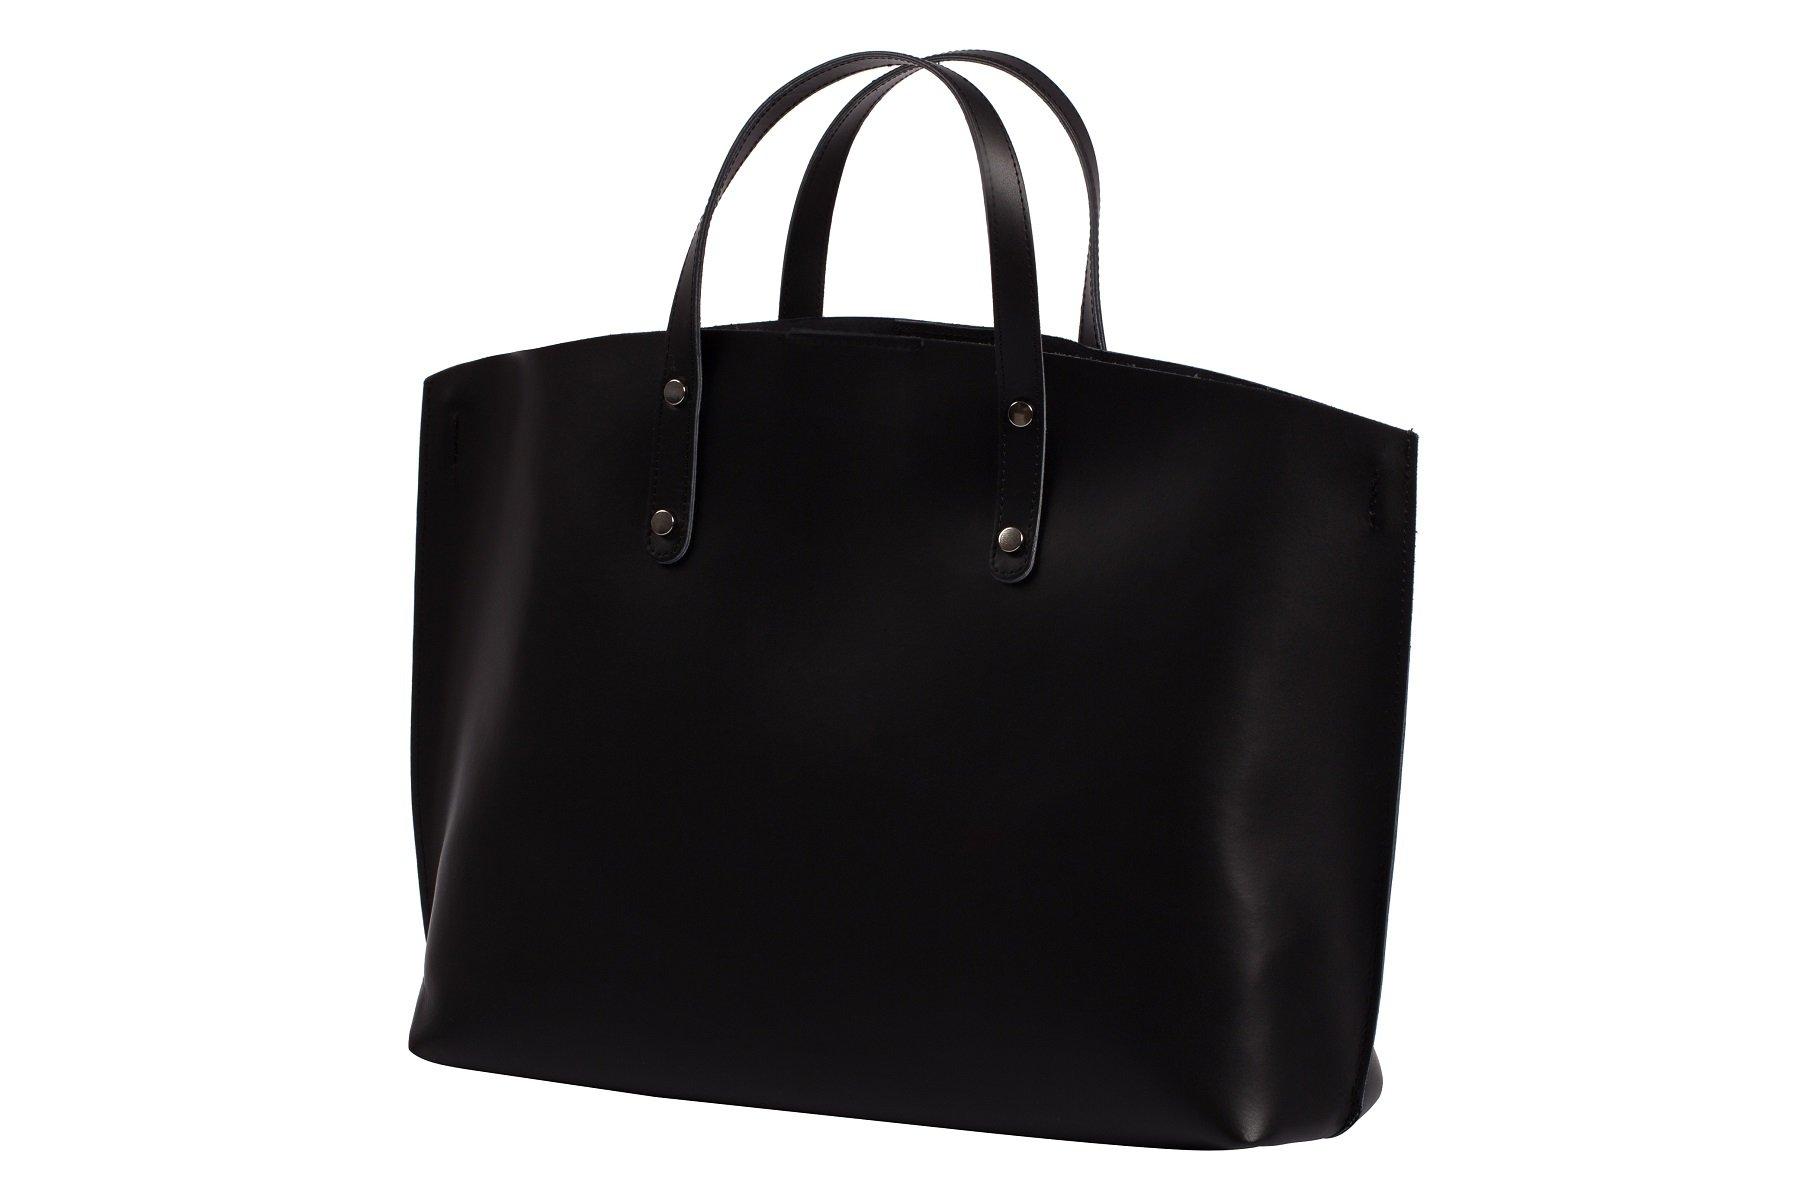 299272d76f107 ... Włoska torebka A4 shopper bag SKÓRA naturalna ...